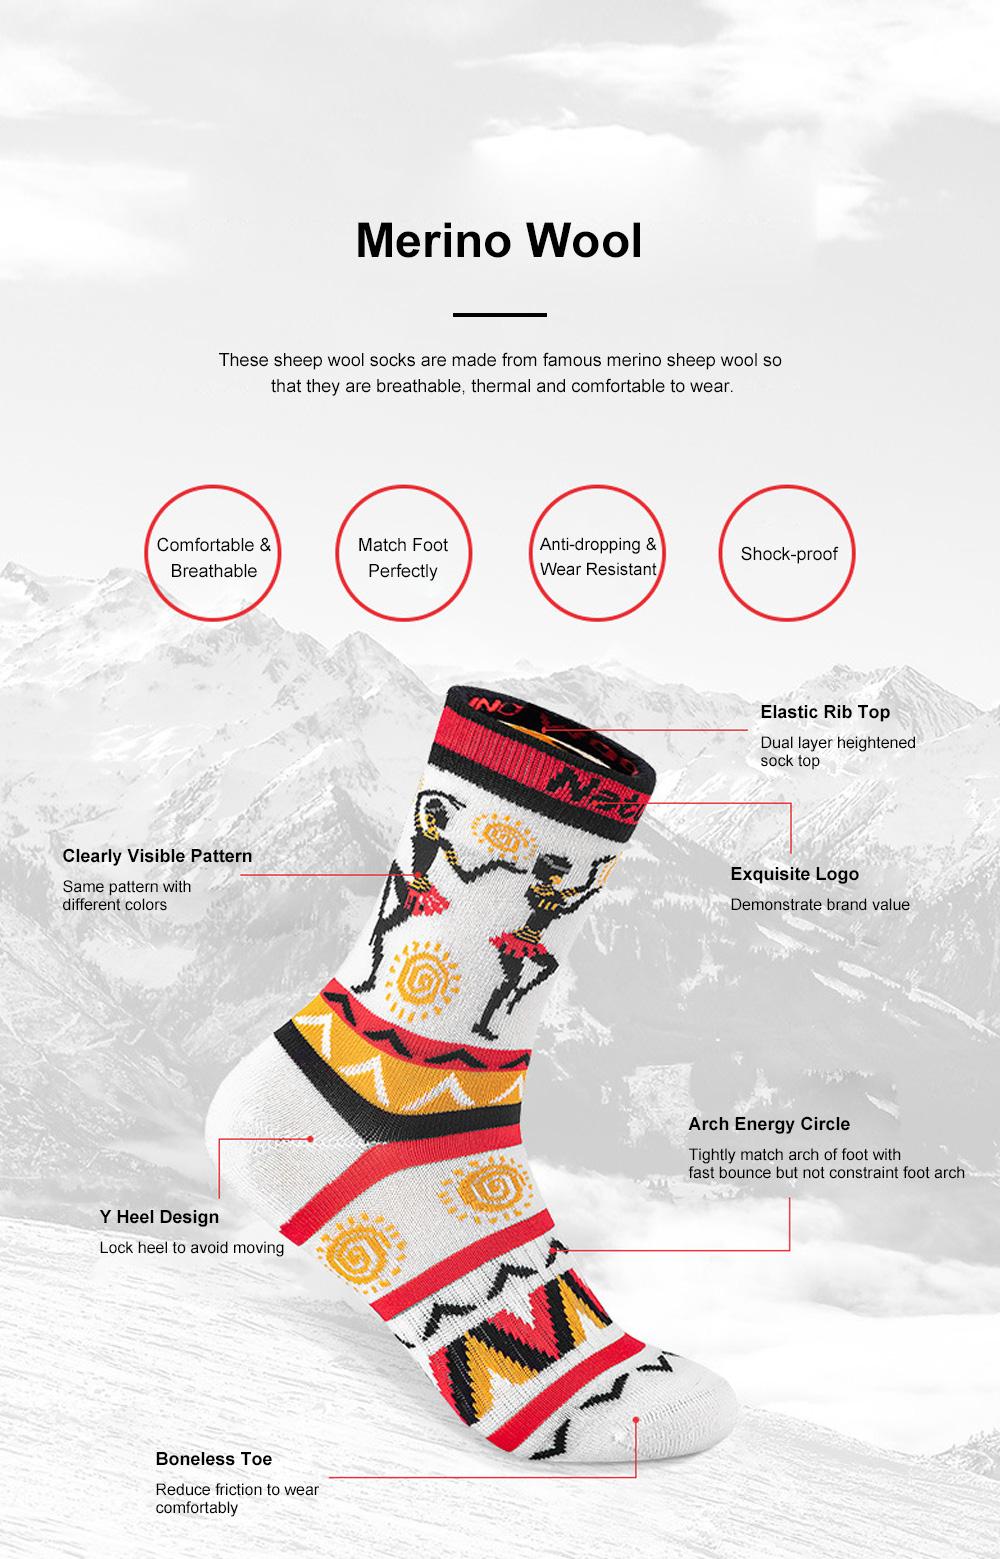 Naturehike Travelling Socks for Multiple Outdoors Activities Merino Sheep Wool Socks Breathable and Moisture-wicking Sports Socks 2